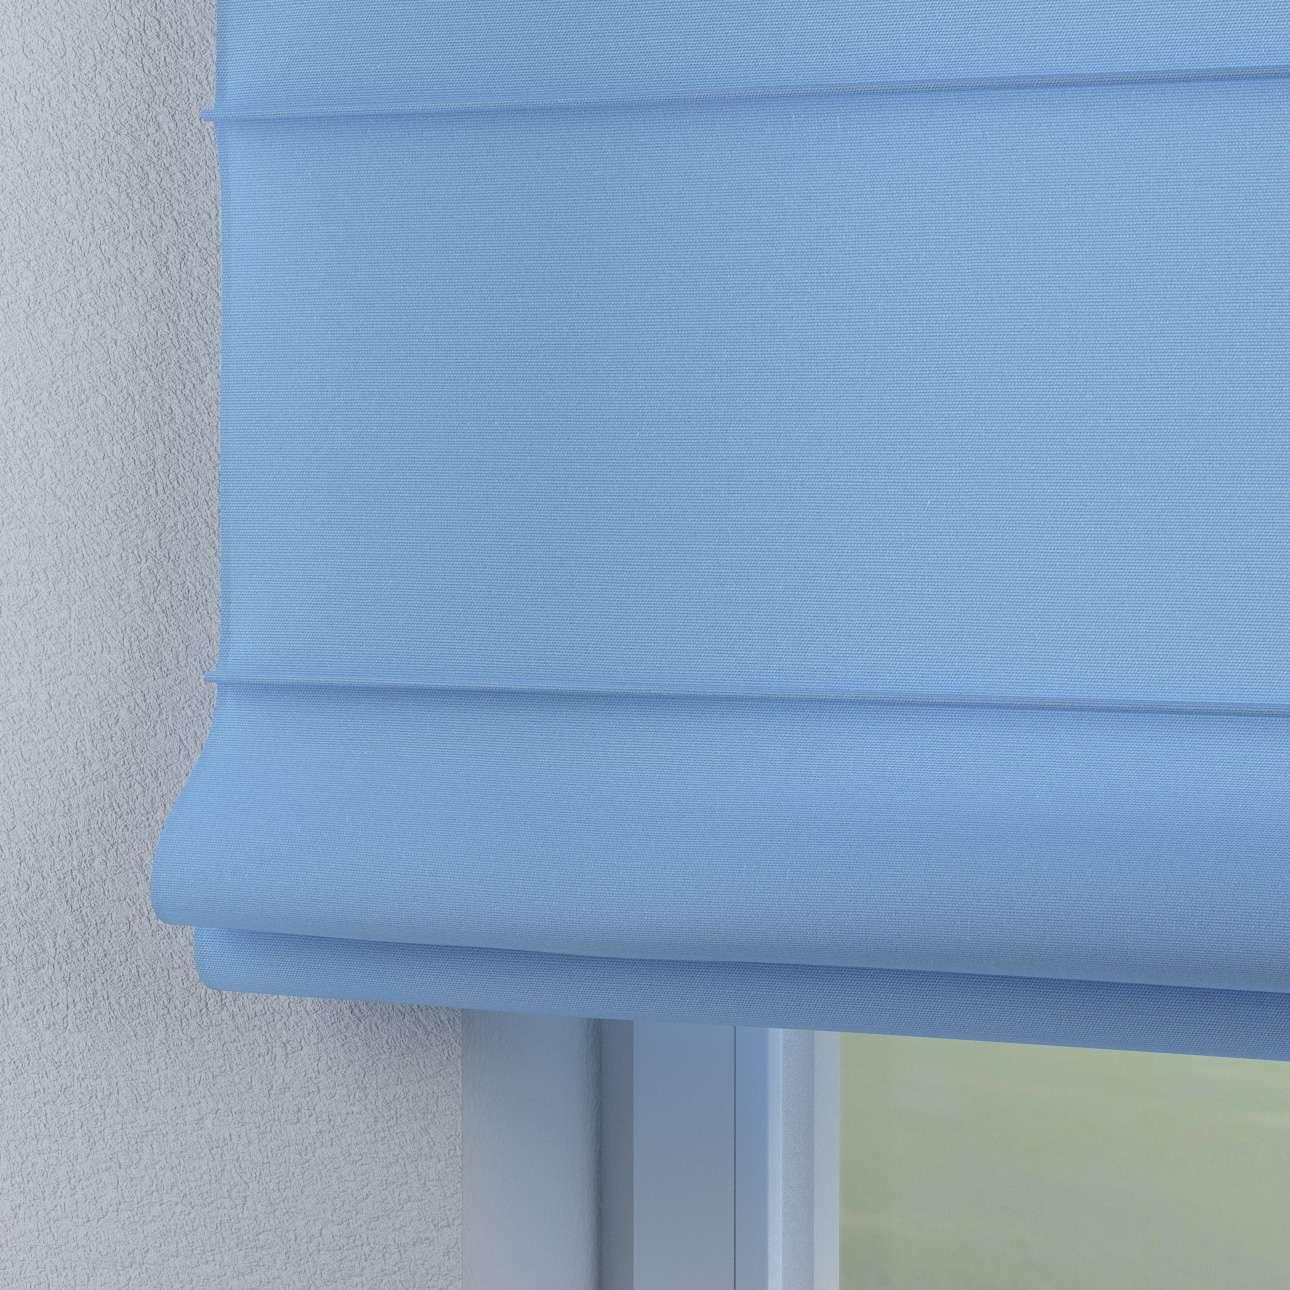 Romanetės Capri 80 x 170 cm (plotis x ilgis) kolekcijoje Loneta , audinys: 133-21